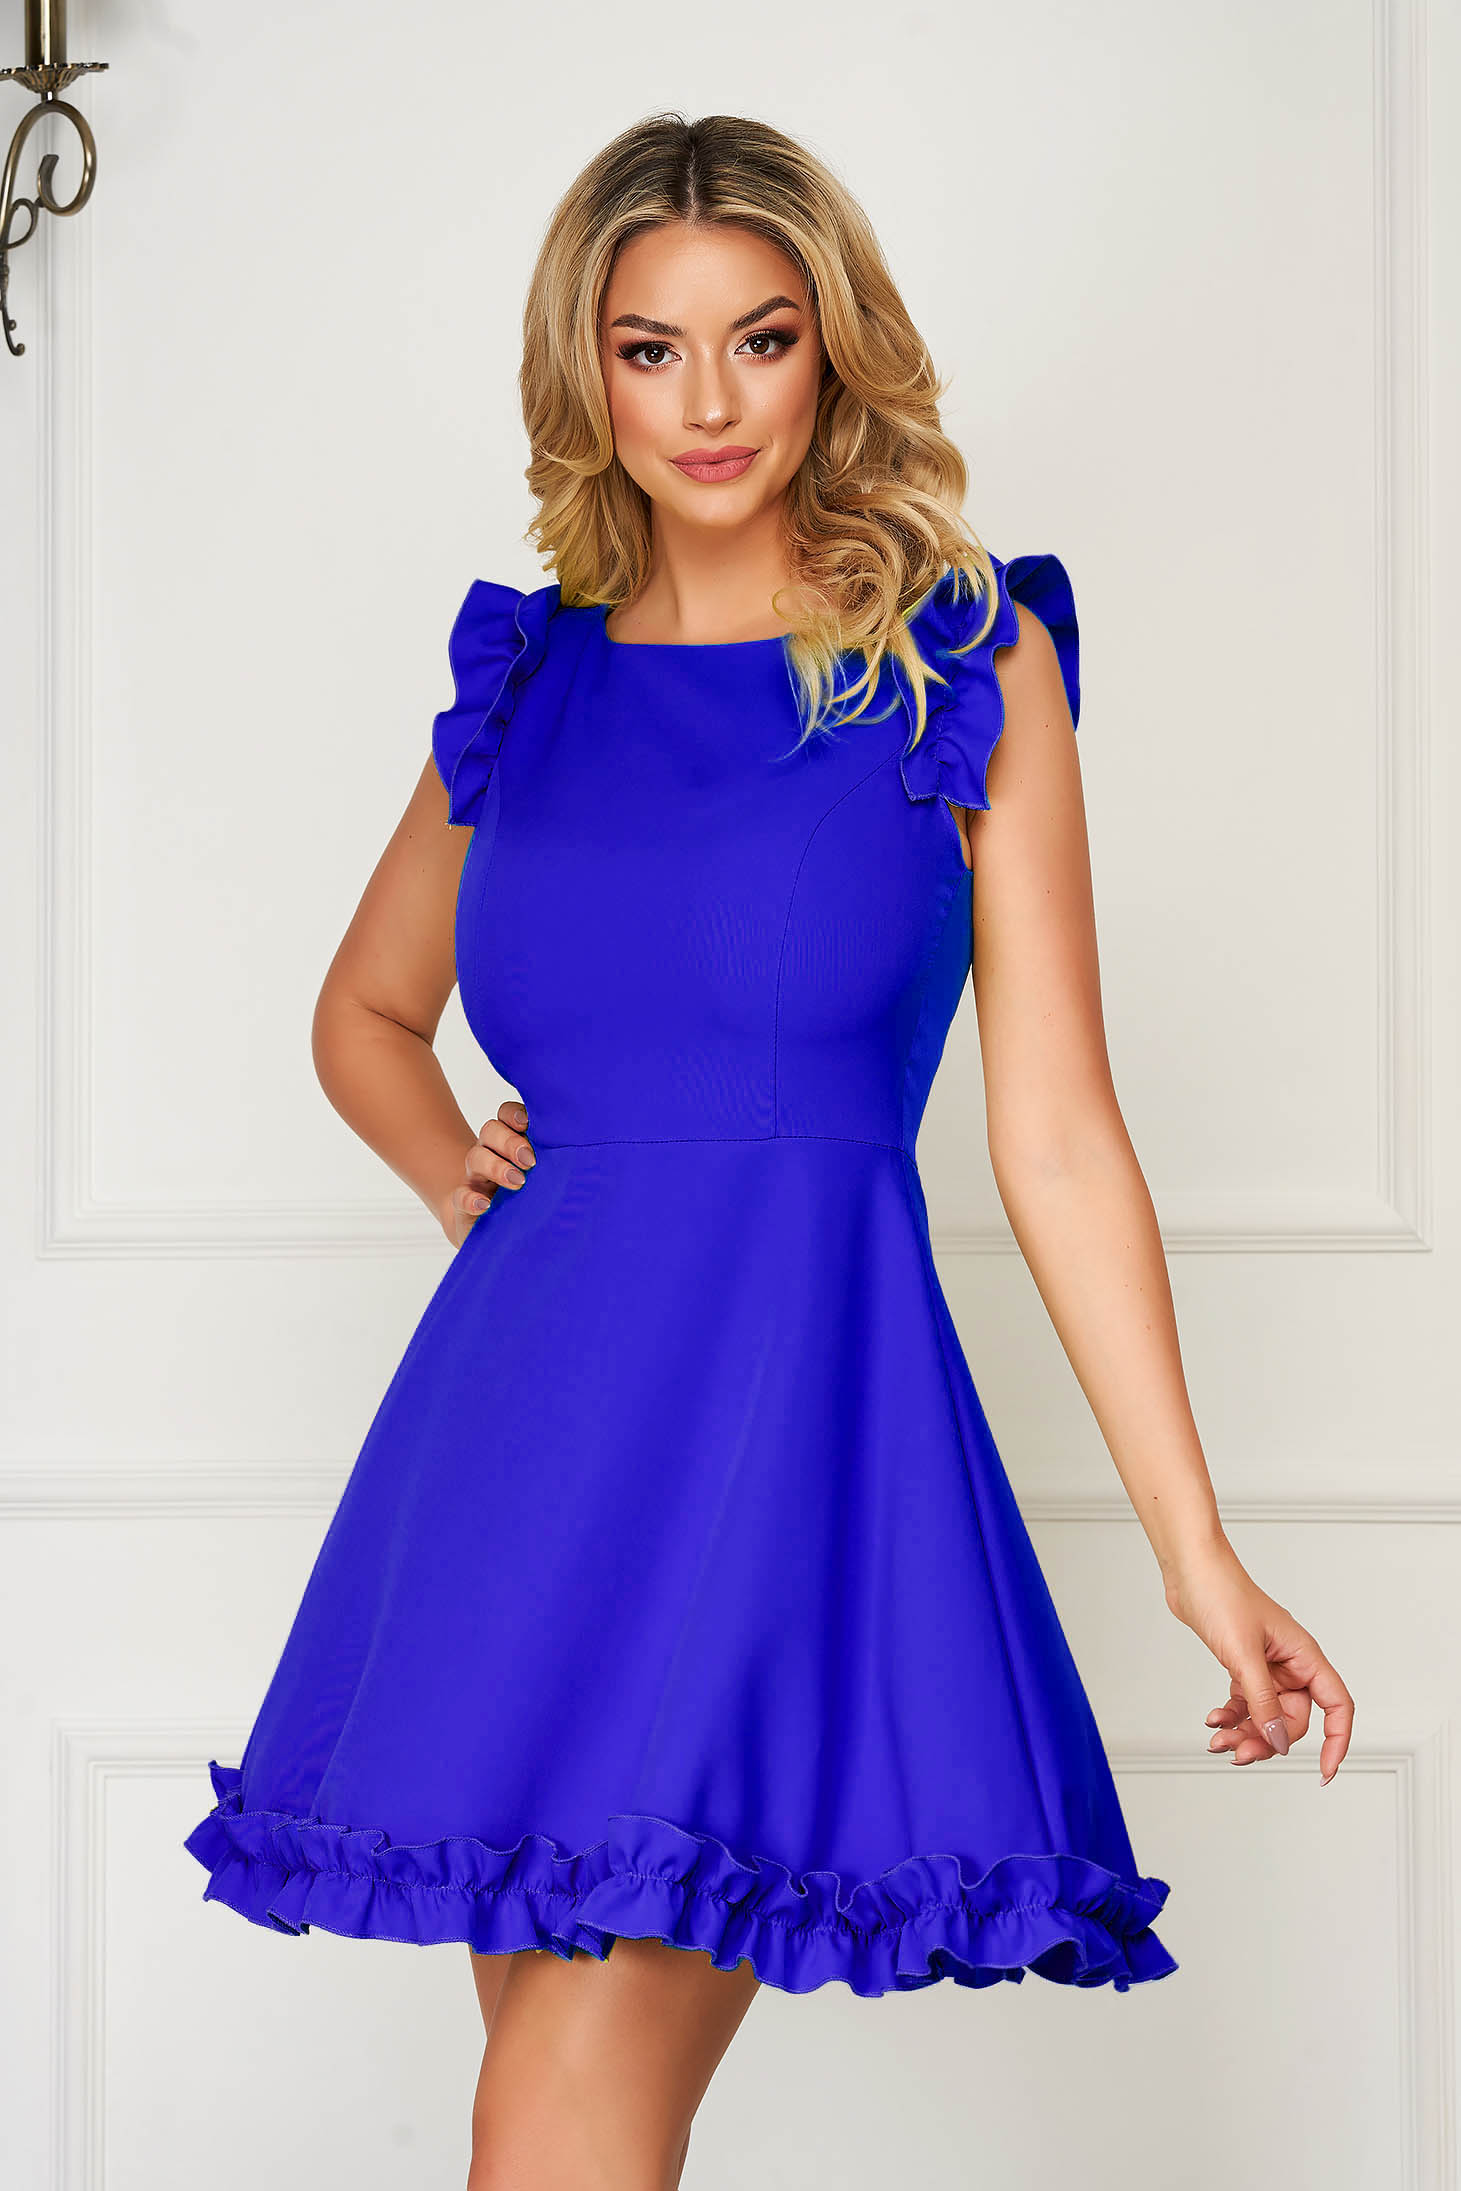 Rochie albastra eleganta scurta din stofa cu volanase la maneca